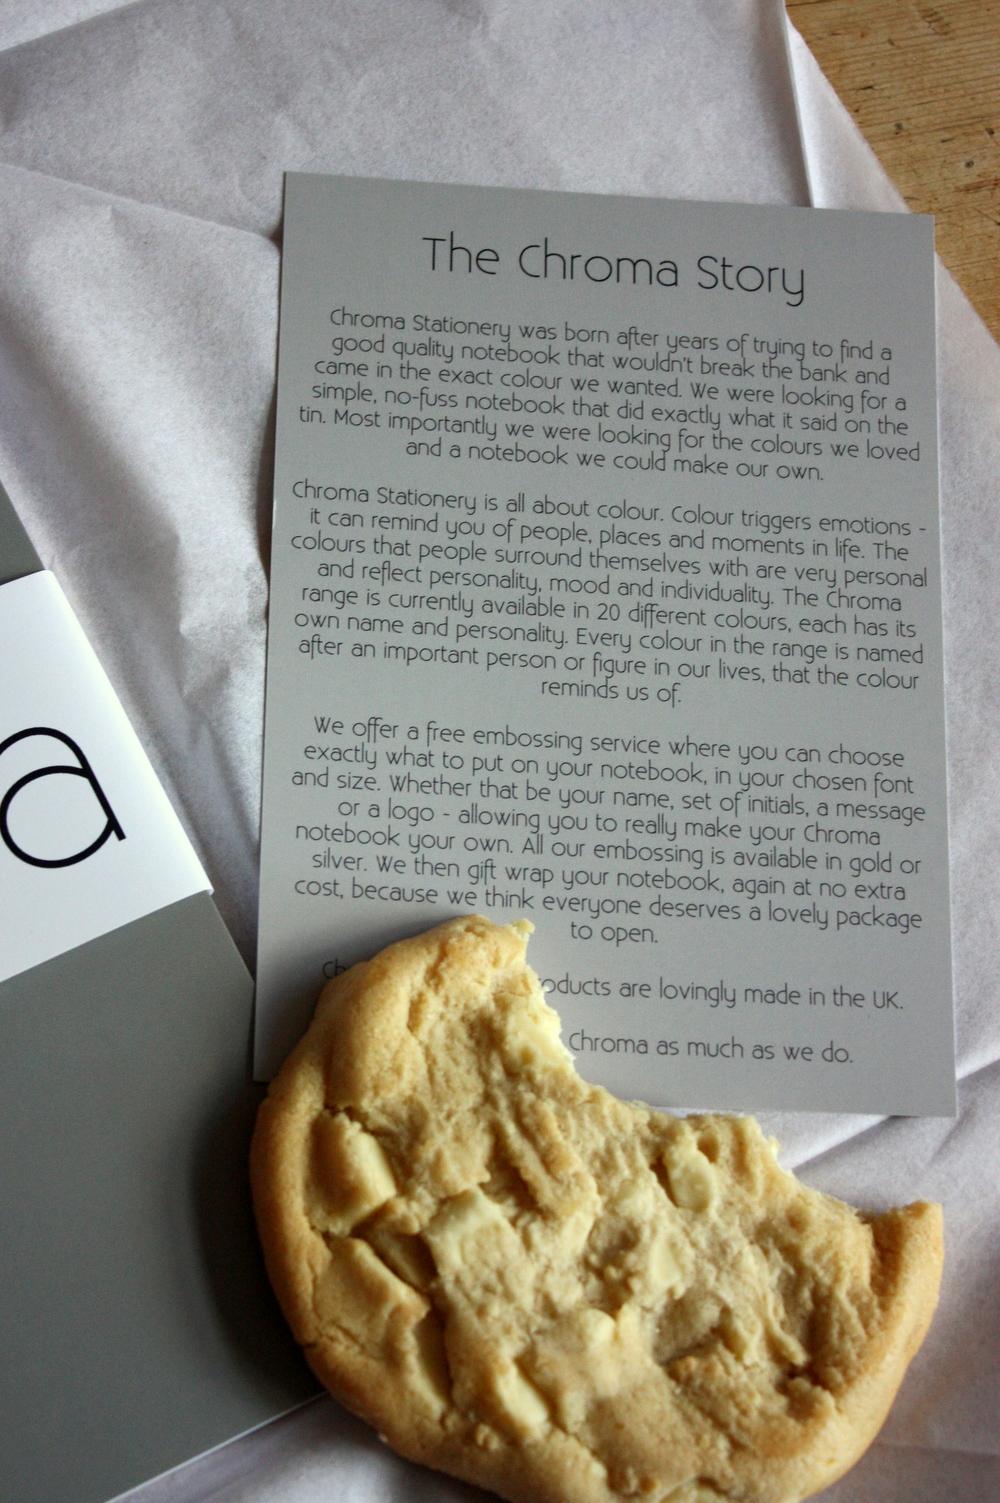 chroma story.jpg